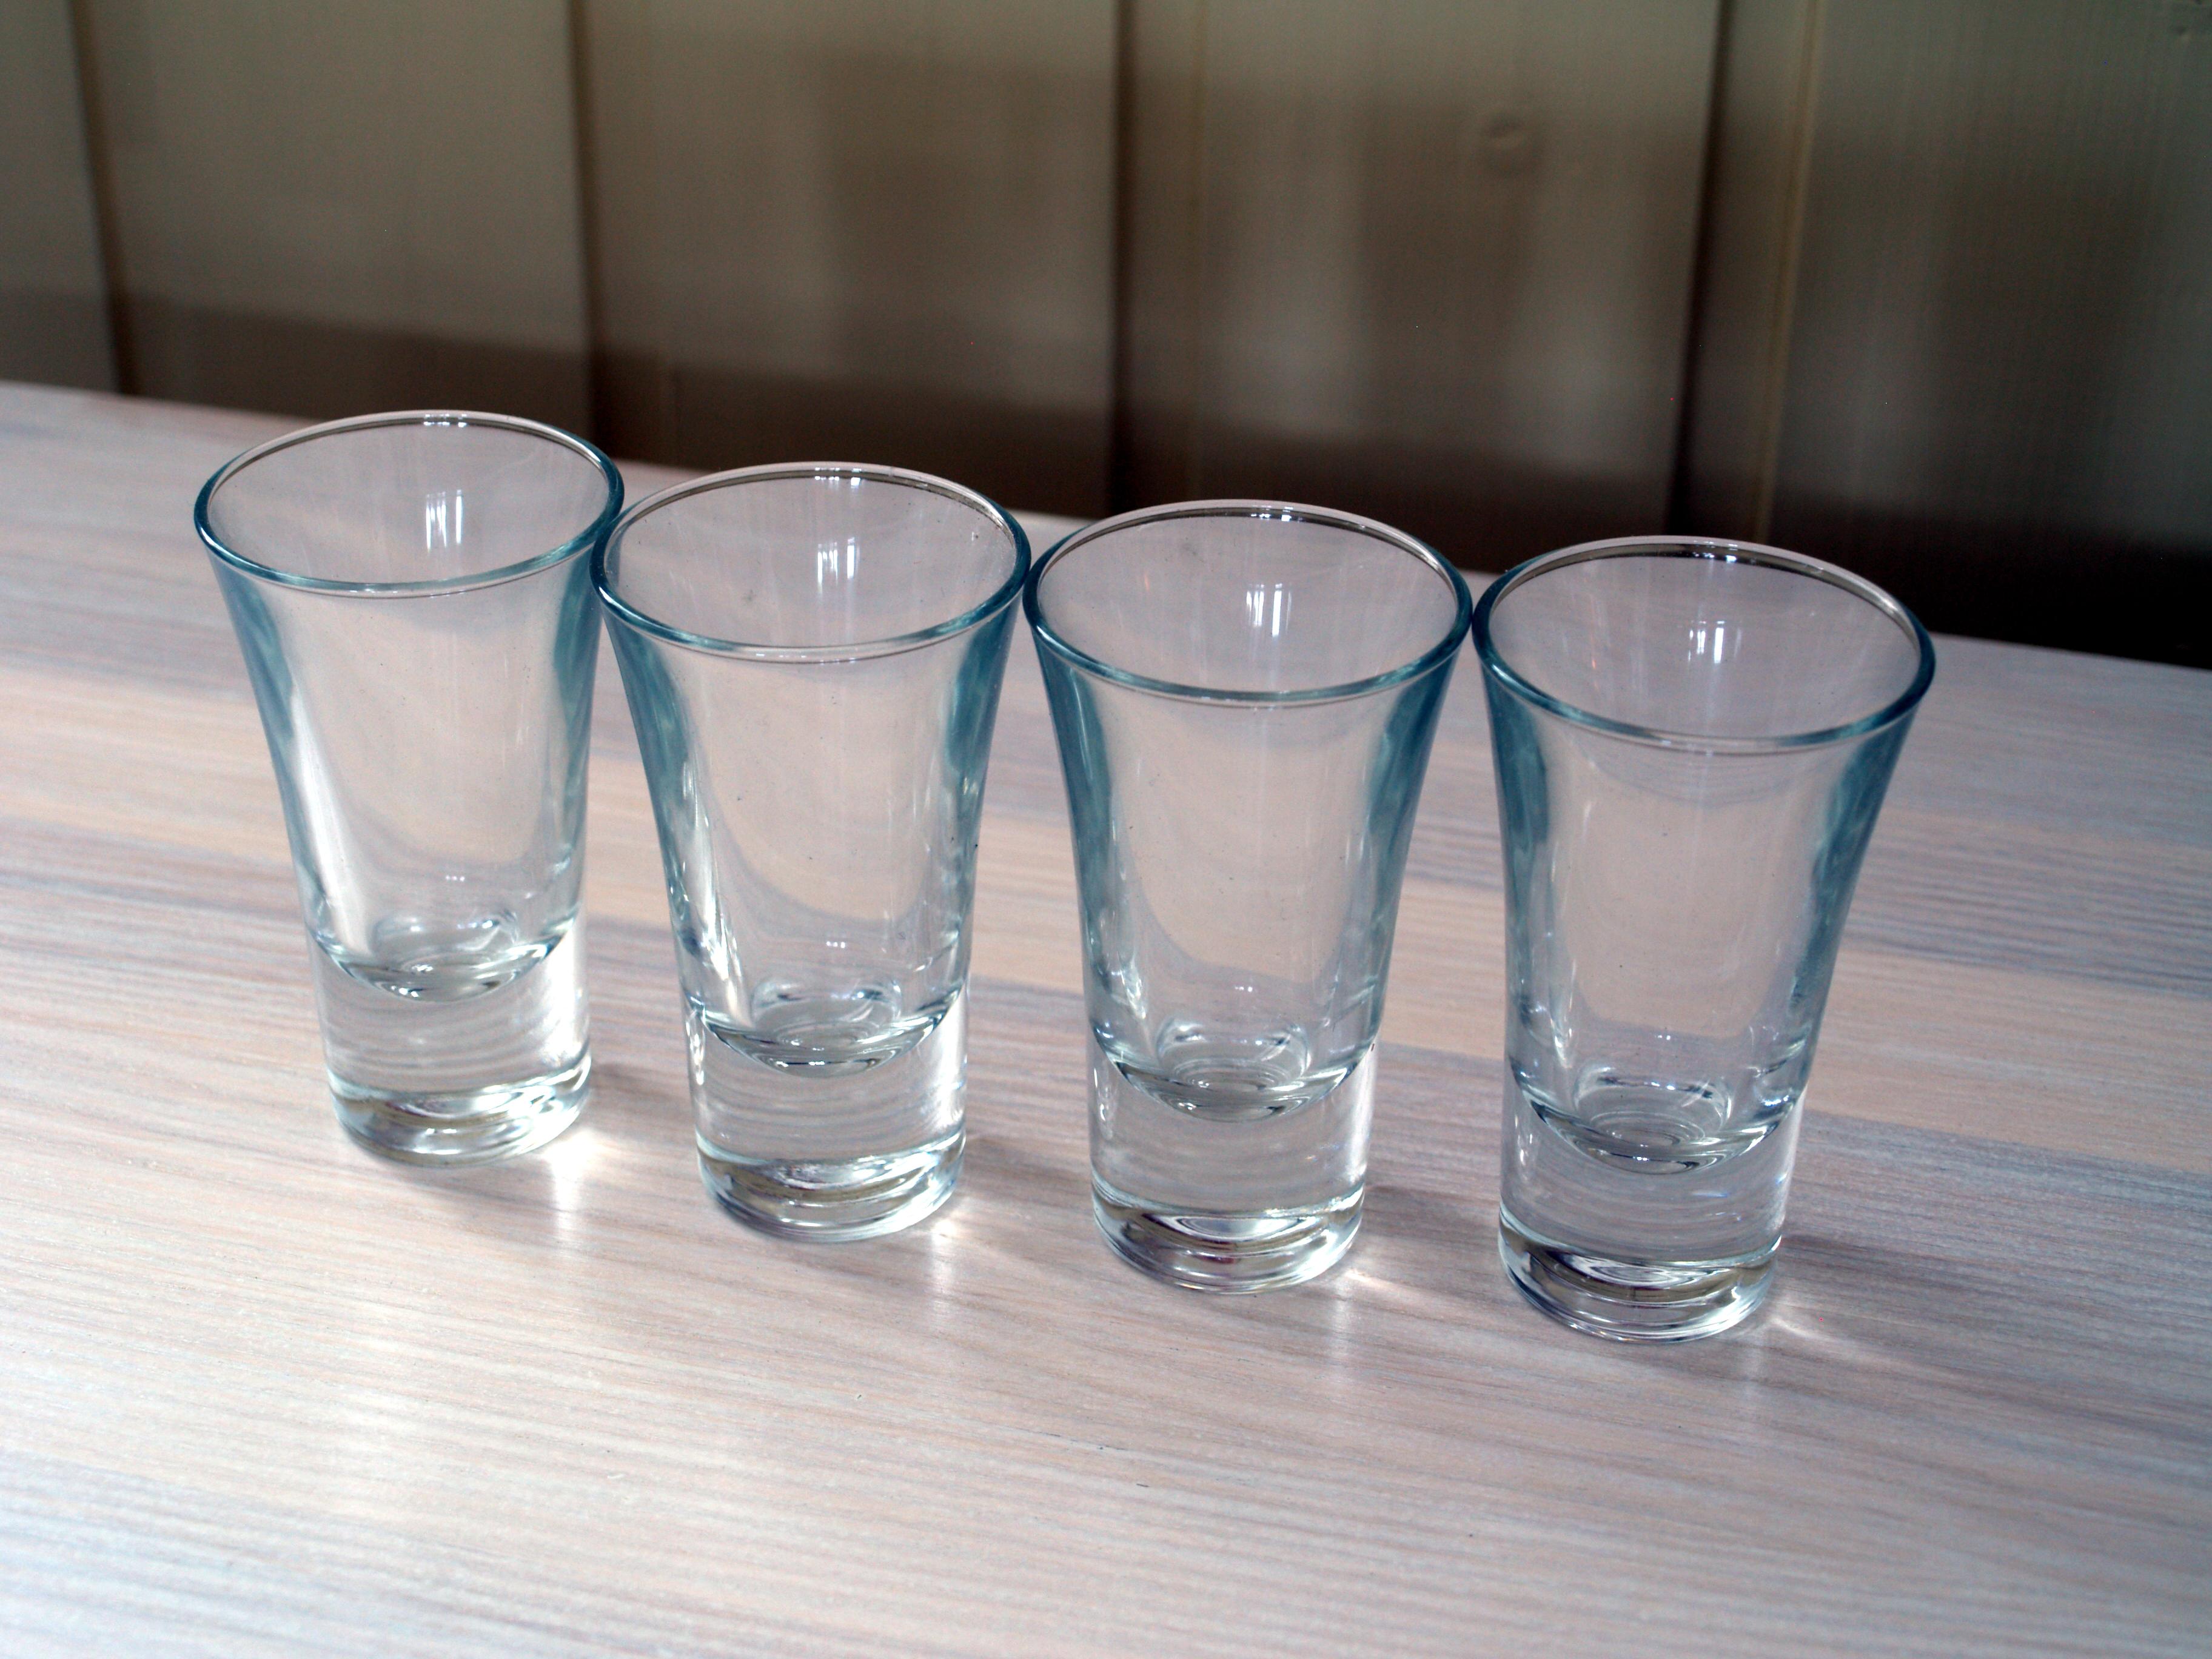 File:Four shot glasses.jpg - Wikimedia Commons